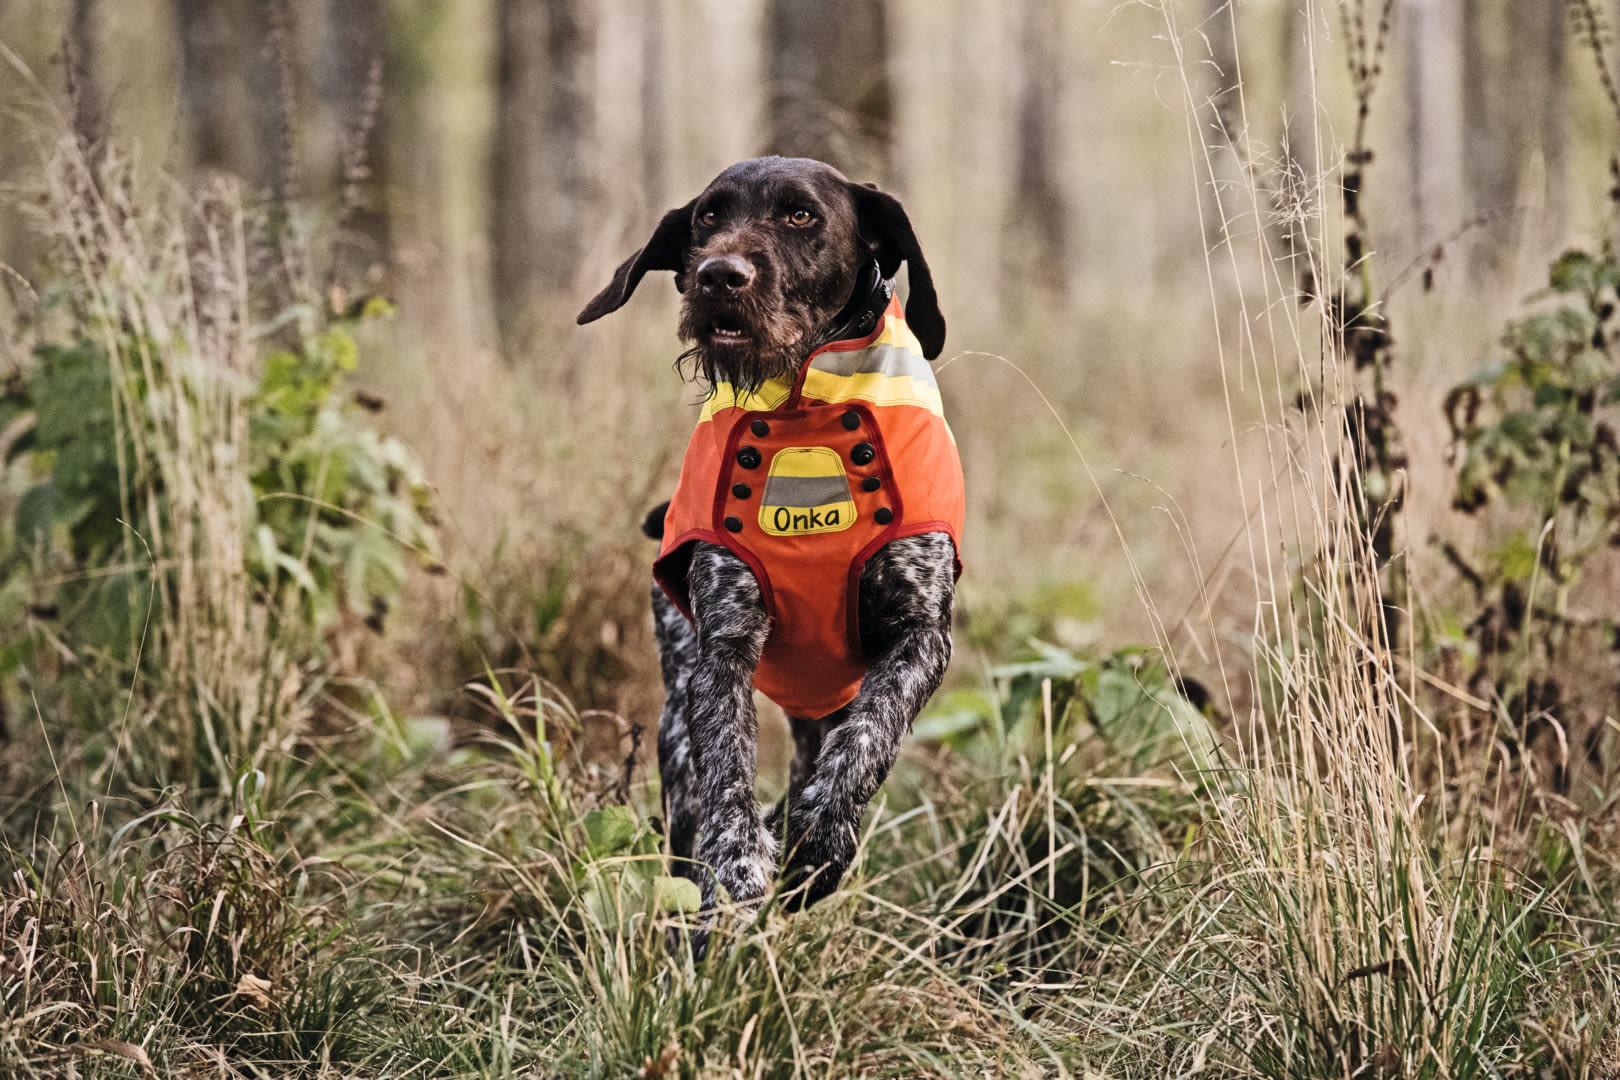 Z8i 0,75-6x20 dog in orange clothing